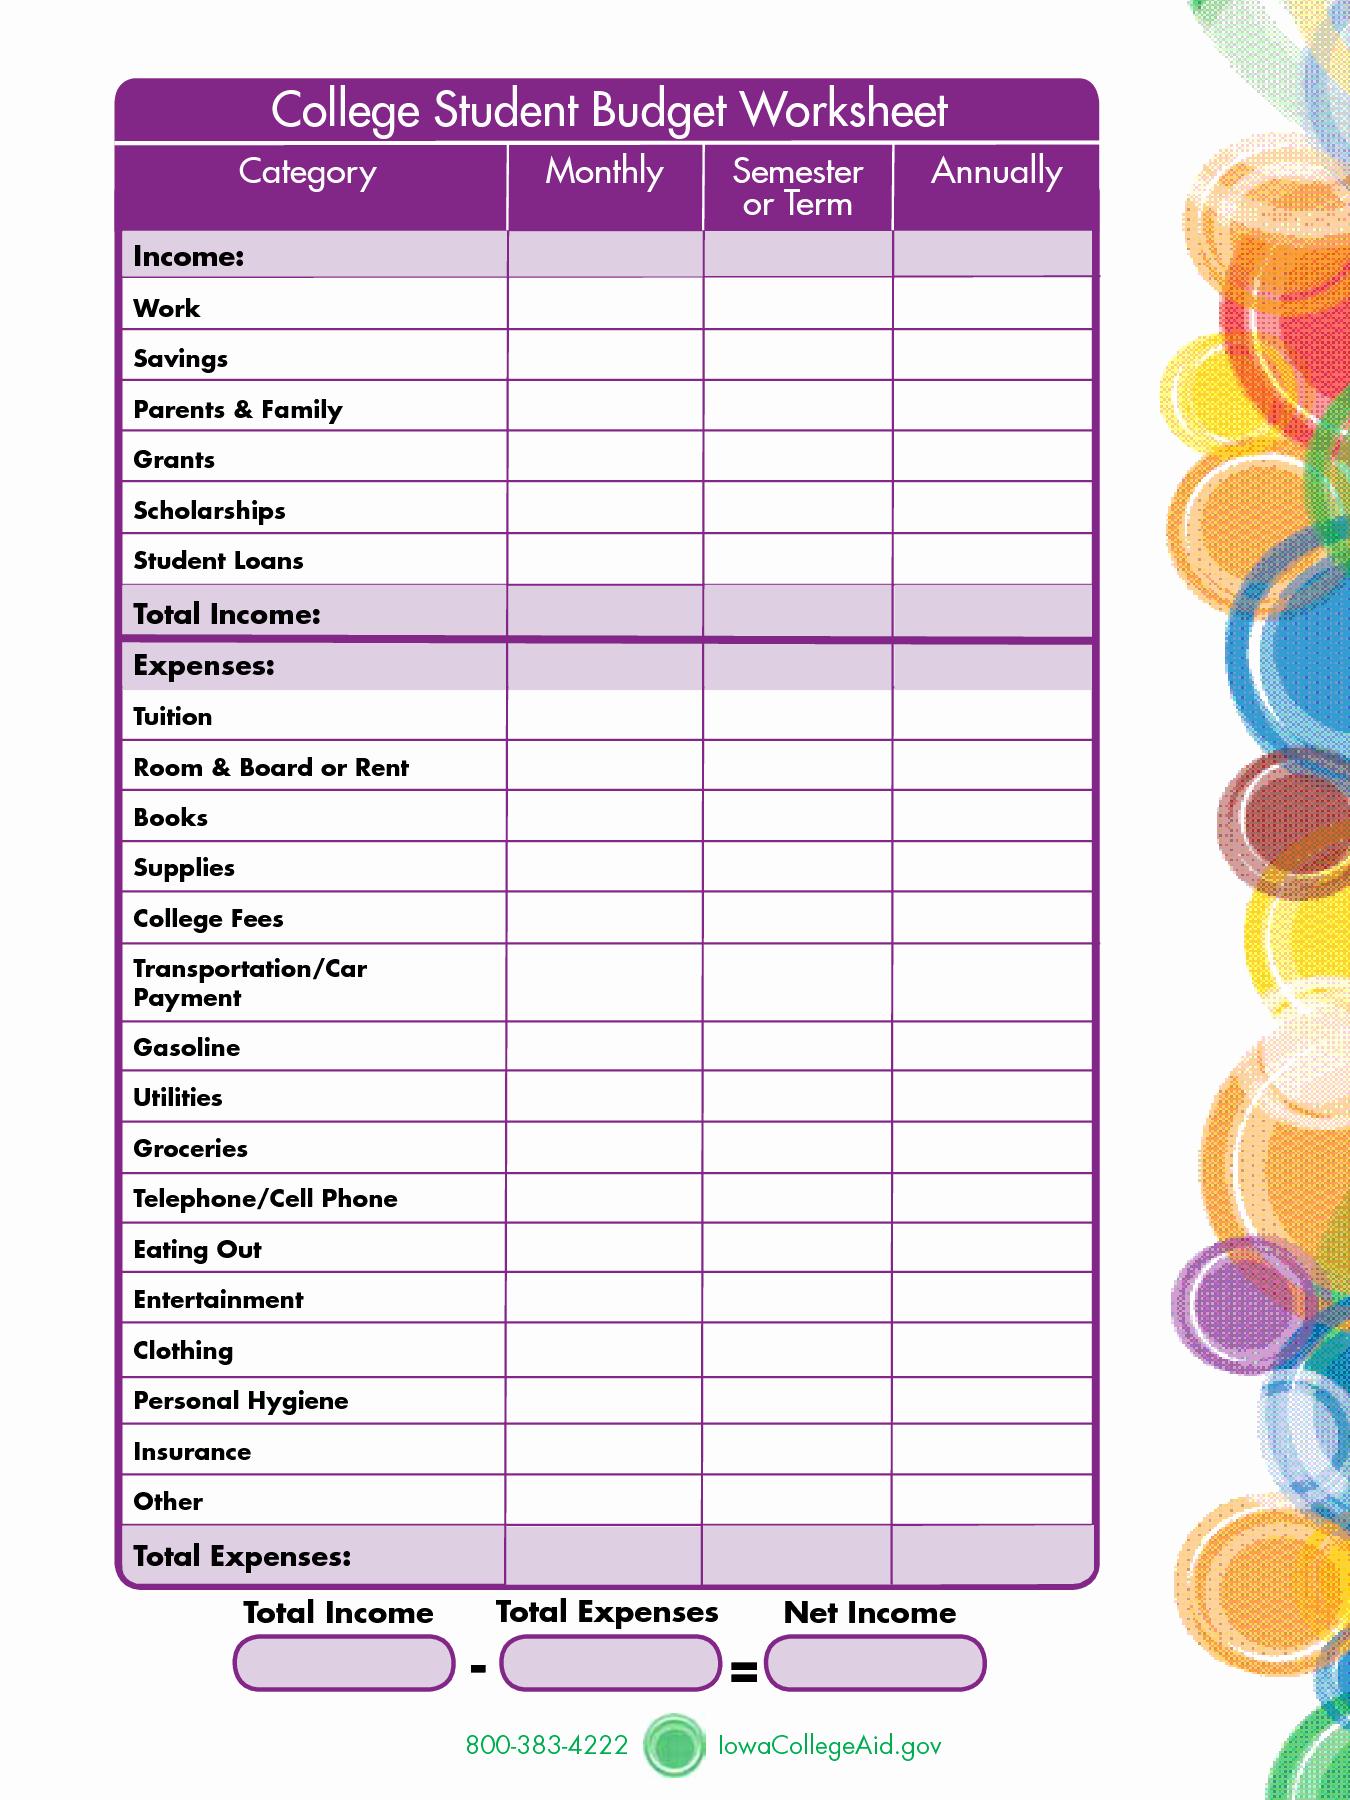 Basic Budget Worksheet College Student Unique 7 Best Of Printables for College Students College